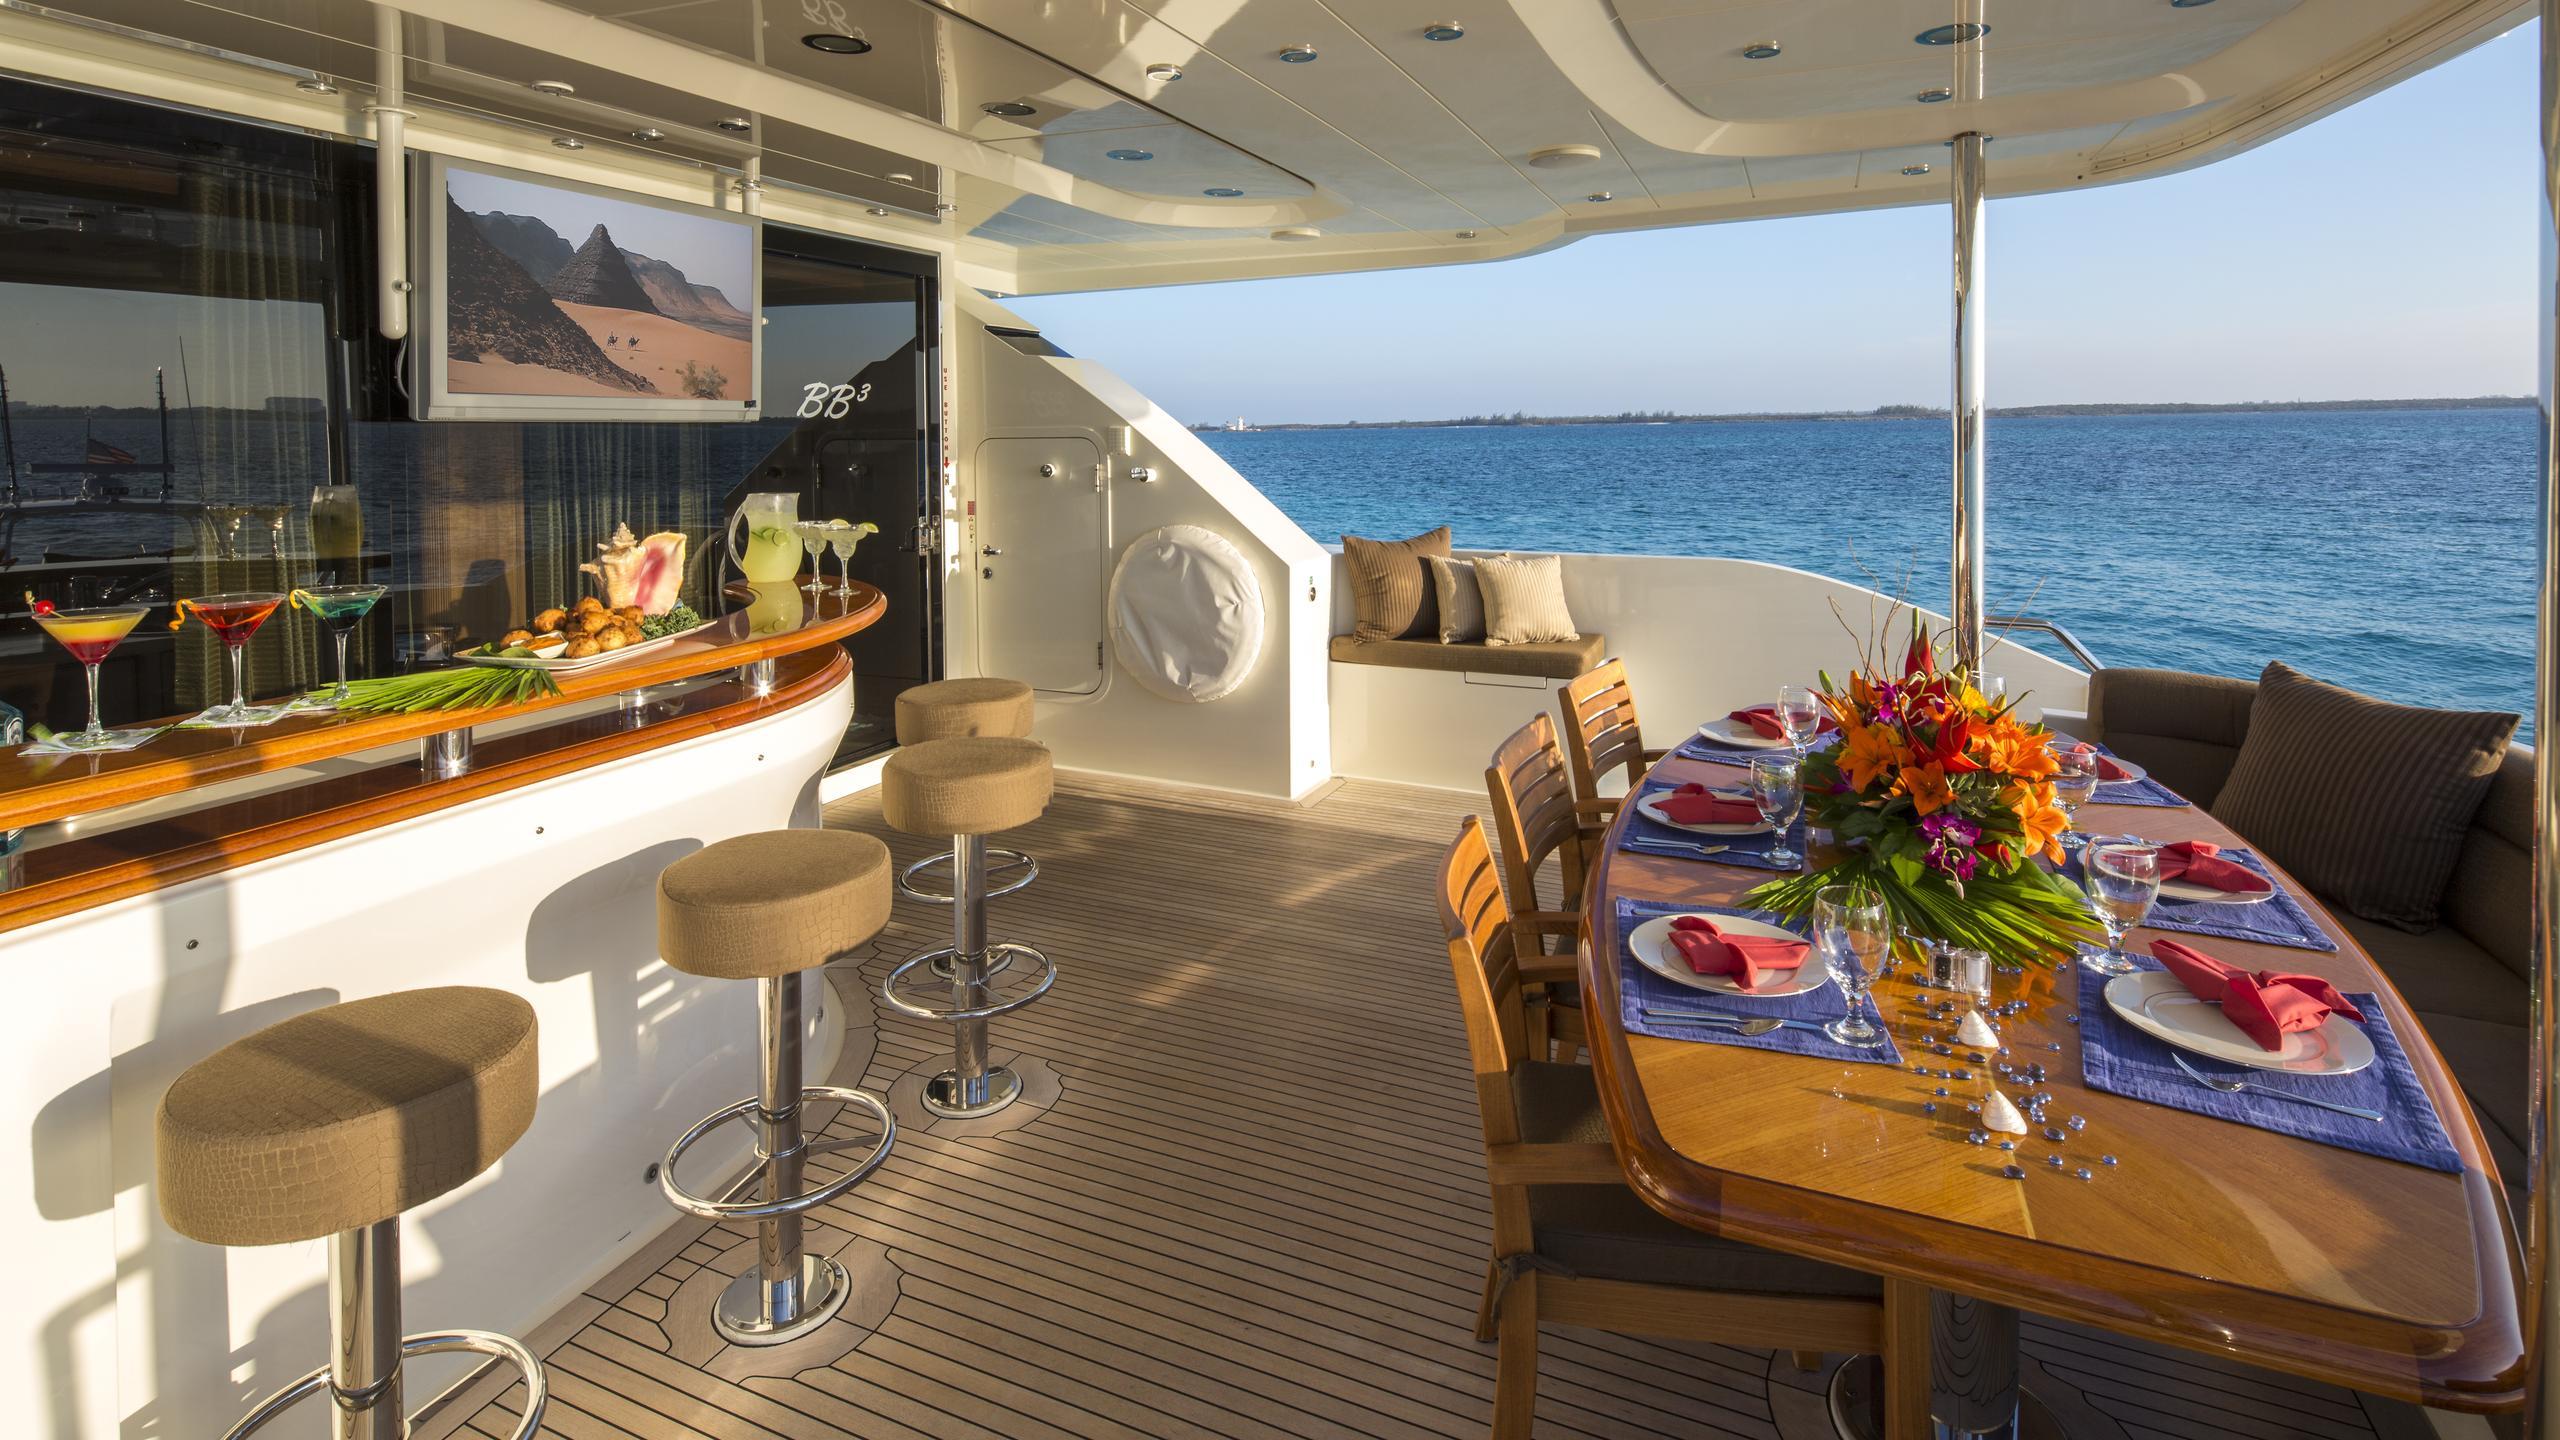 bb3-yacht-aft-dining